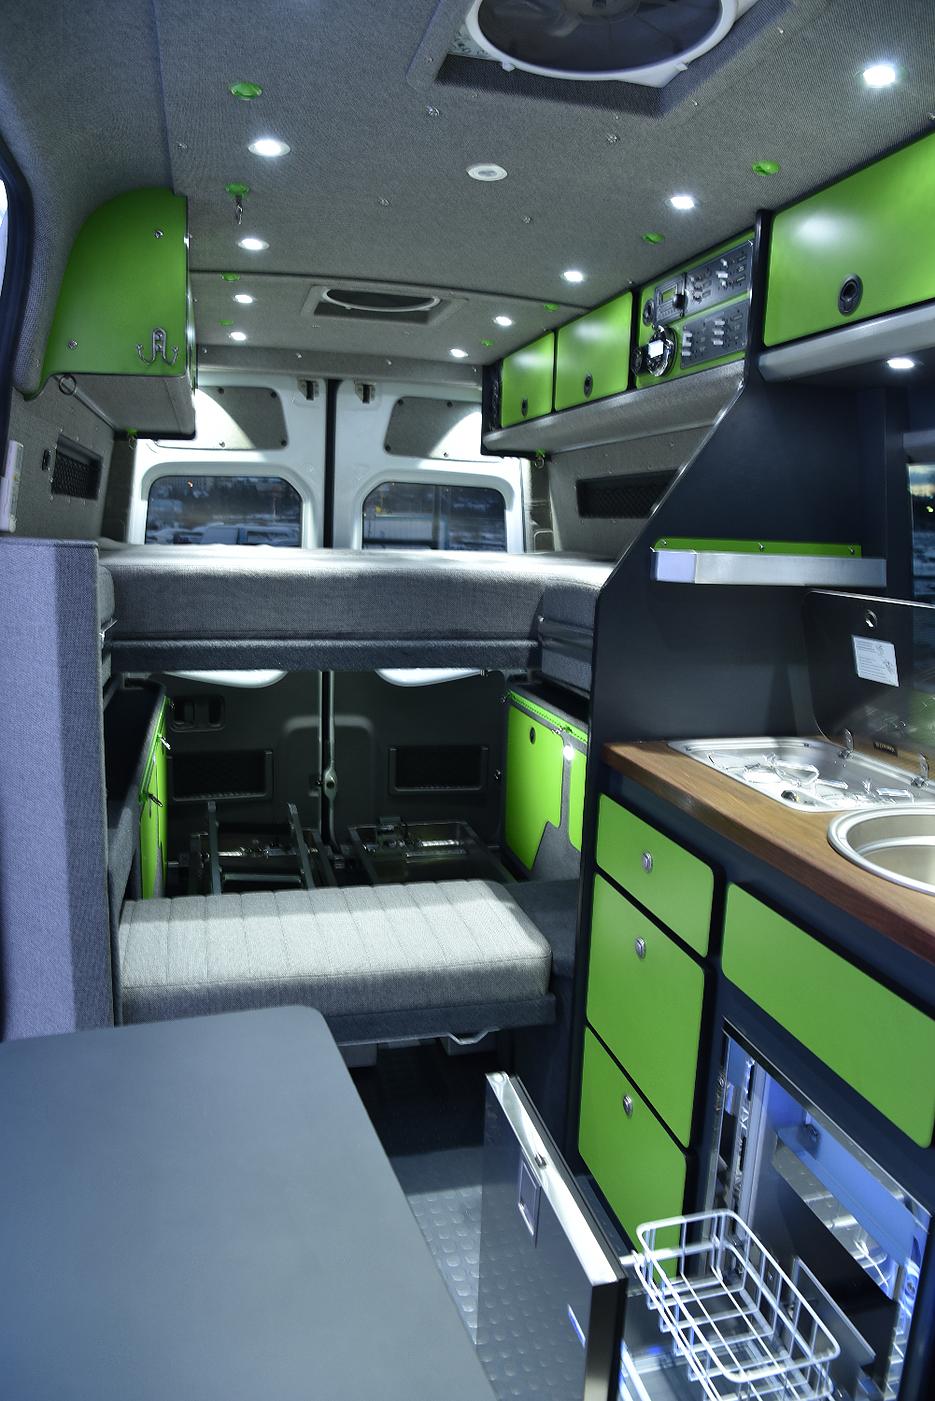 alaska camper van conversions gallery camper wohnmobile pinterest wohnmobil campingbus. Black Bedroom Furniture Sets. Home Design Ideas